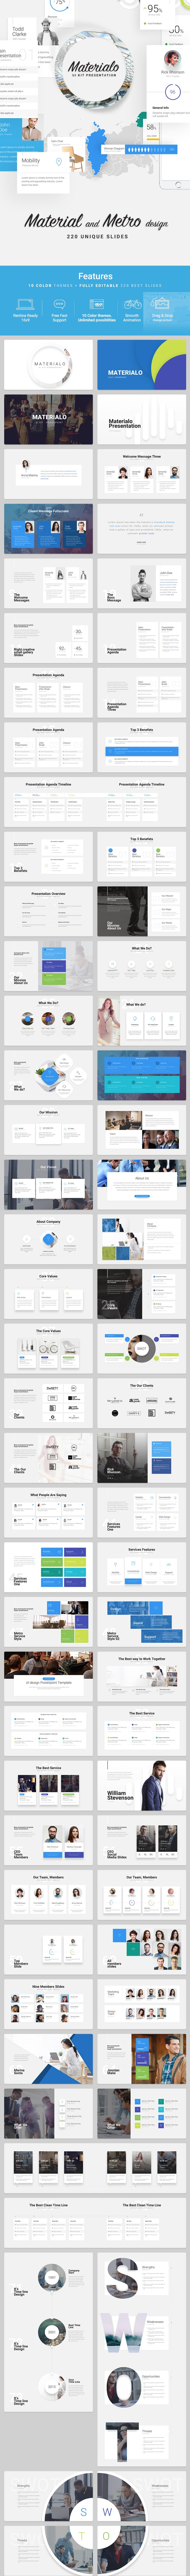 Materialo Keynote UI KIT - Business Keynote Templates